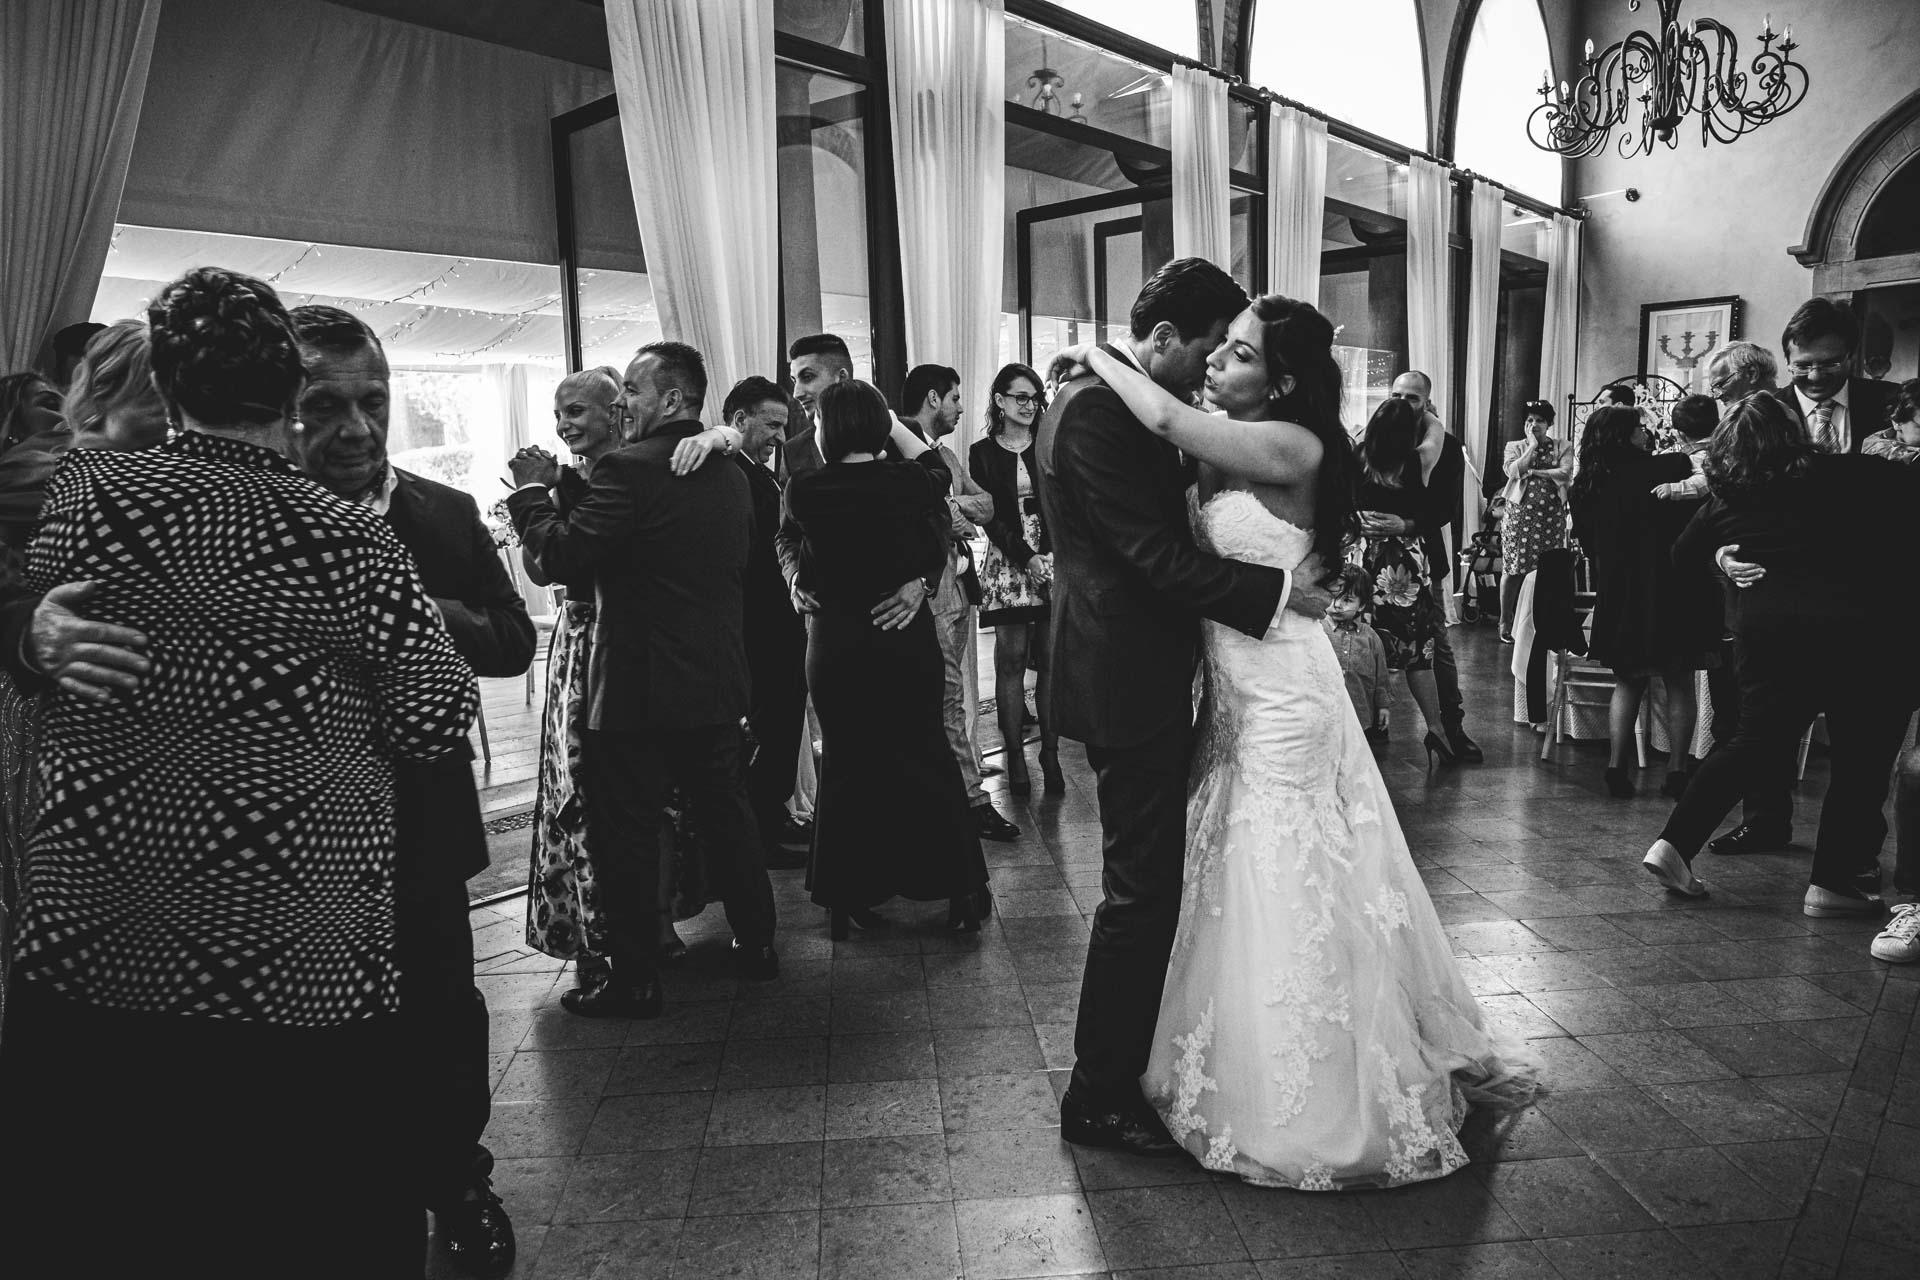 matrimonio sposi ballo ricevimento bianco e nero